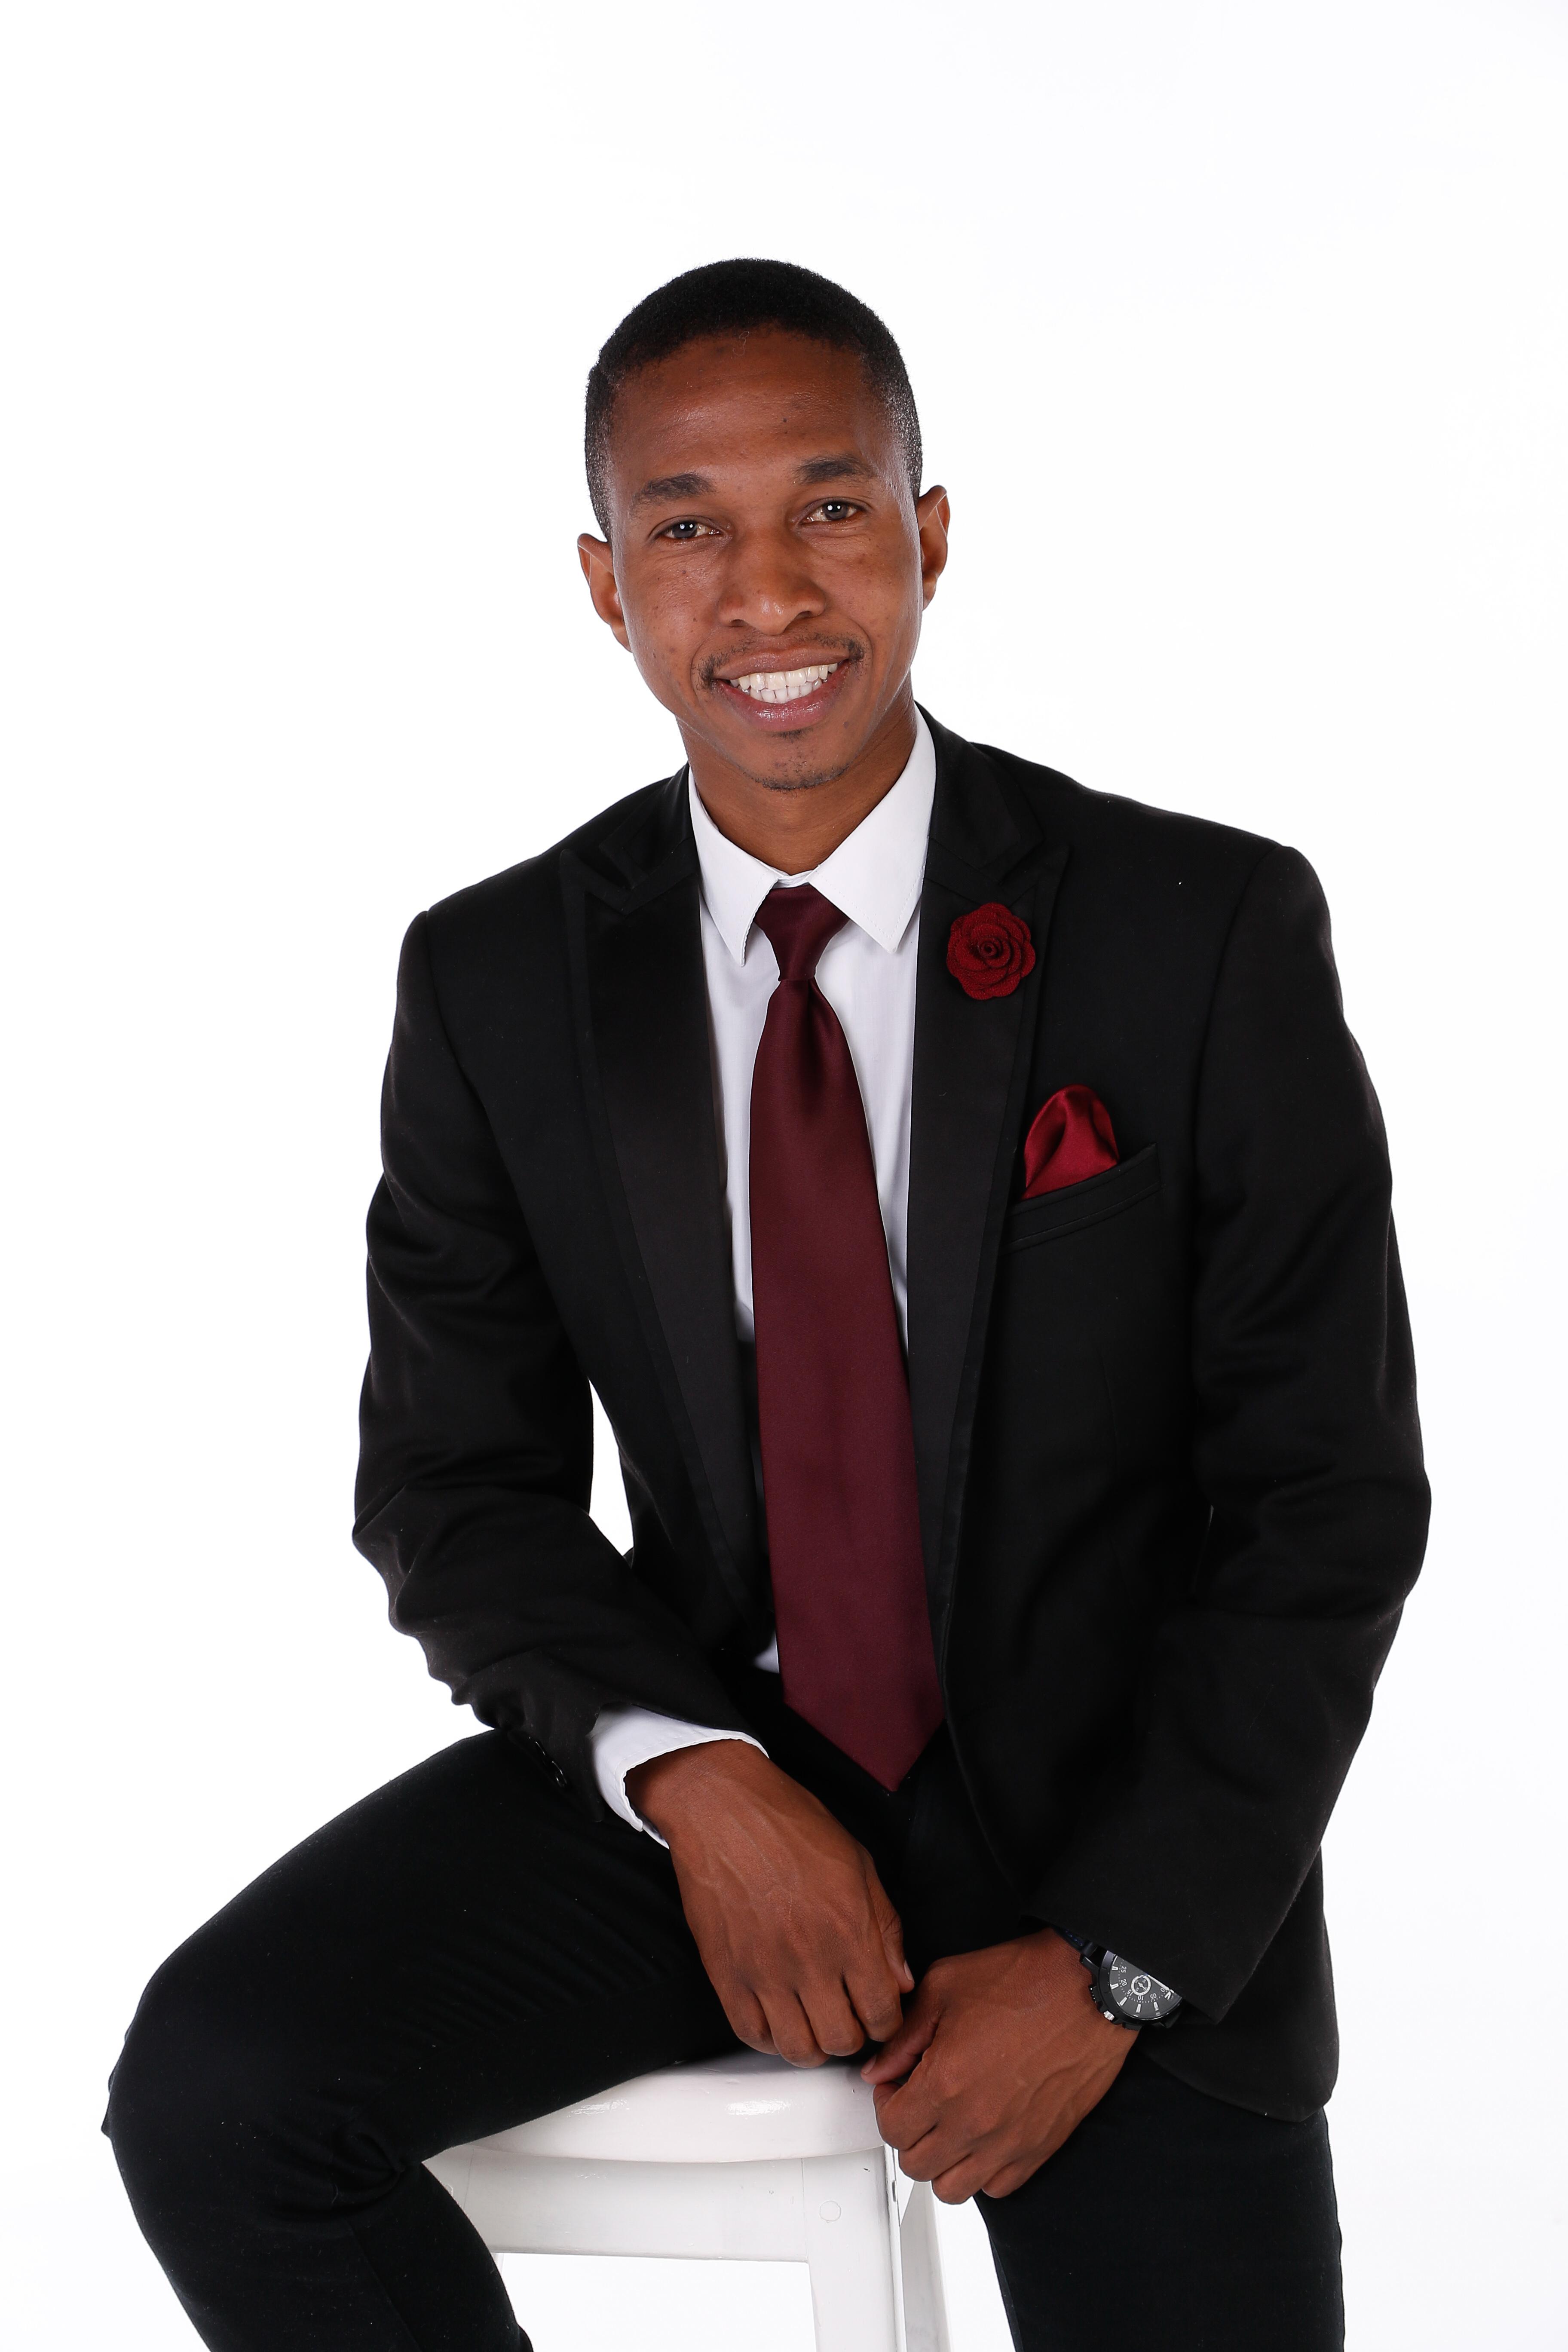 Thabiso Mailula